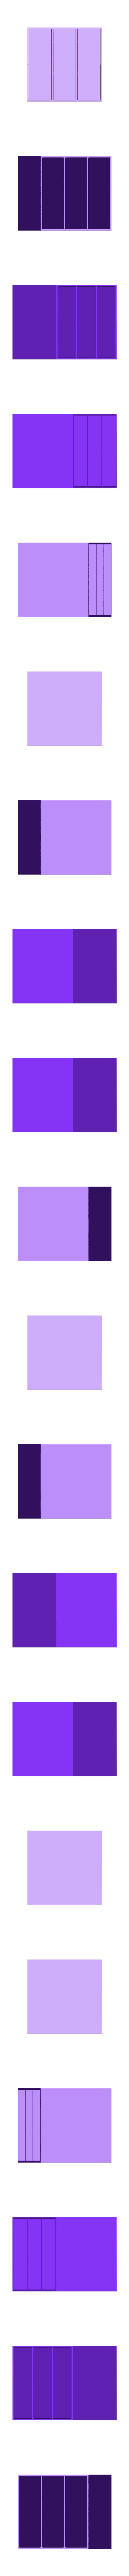 storage_cube_4.stl Download free STL file Storage Cubes • 3D print object, Morcelkin